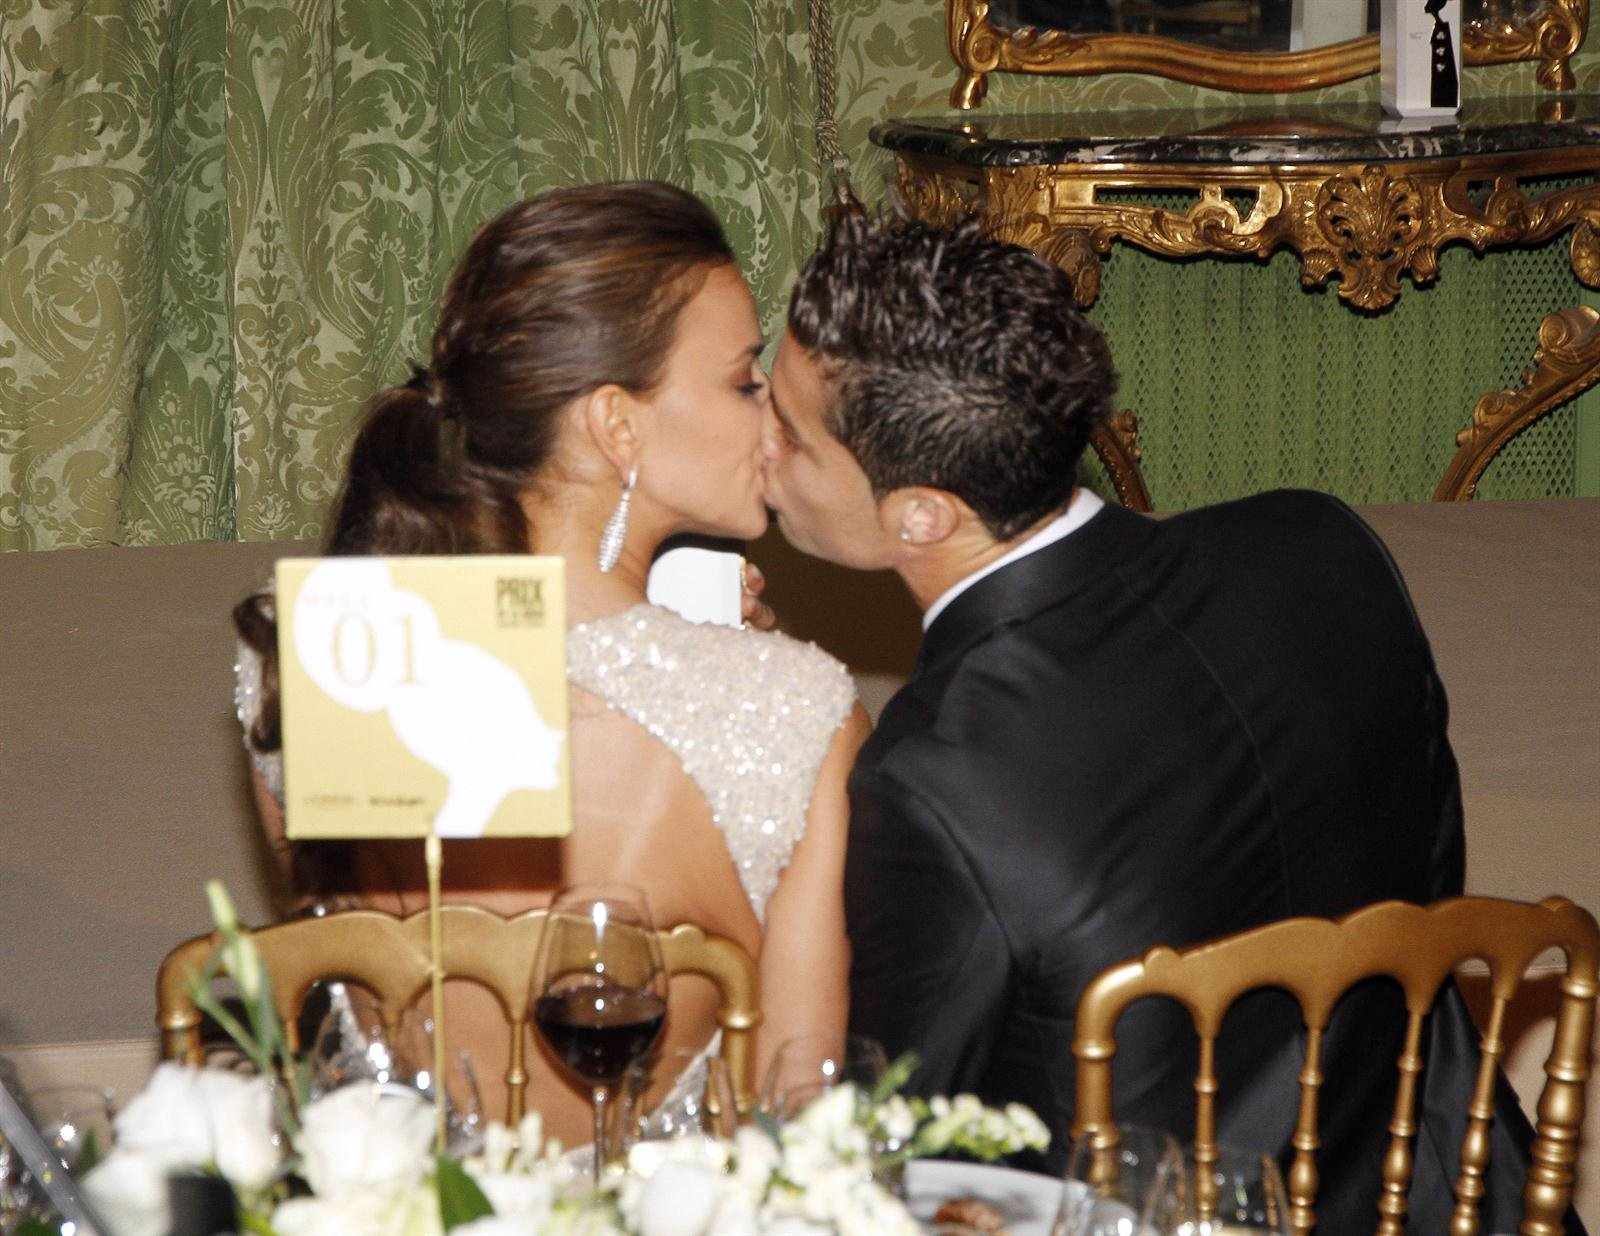 Cristiano Ronaldo E Irina Shayk En Los Premios Marie Claire